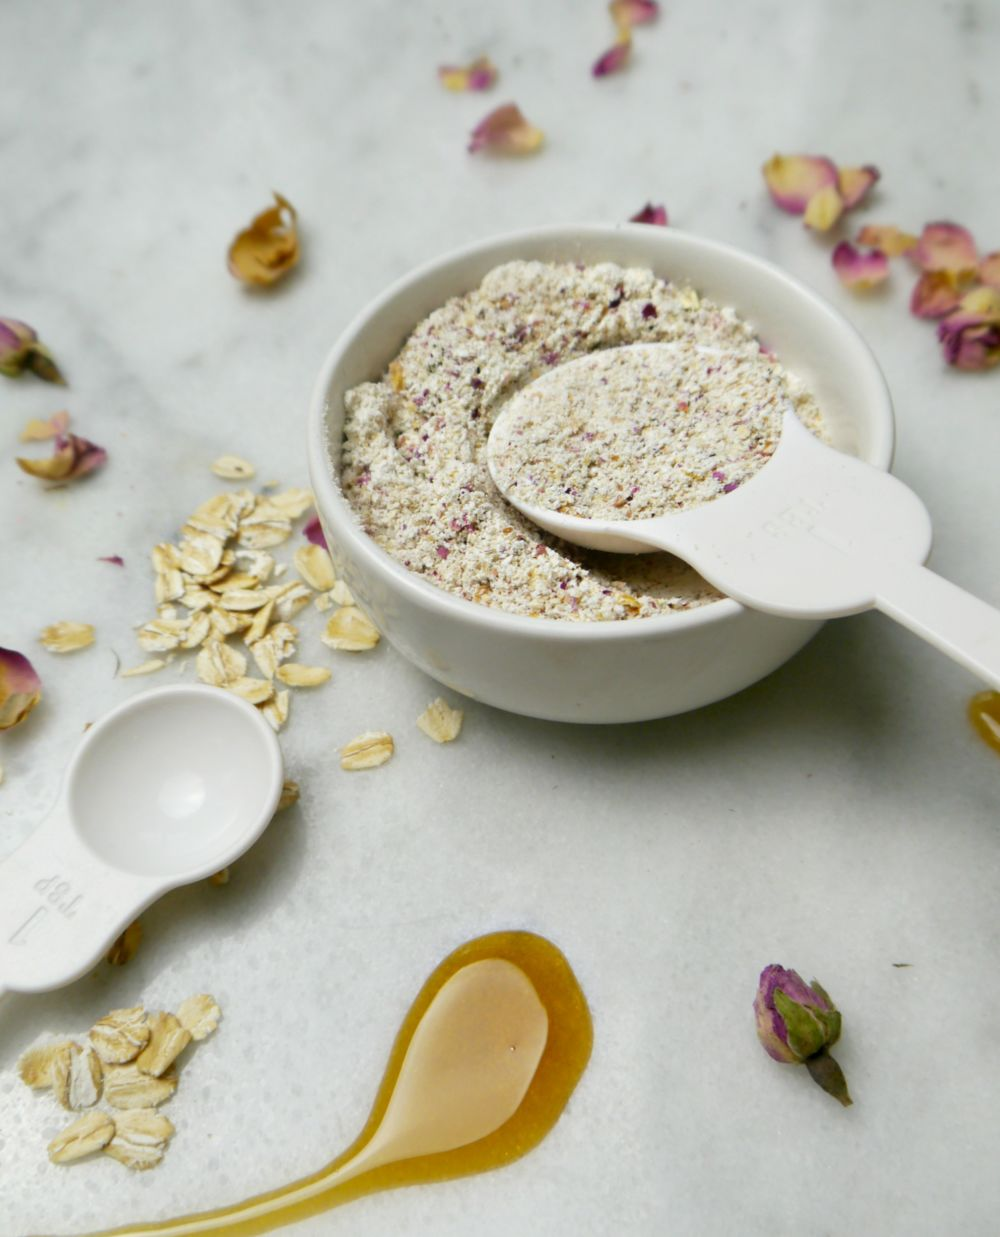 DIY Rose Petal Oatmeal Mask